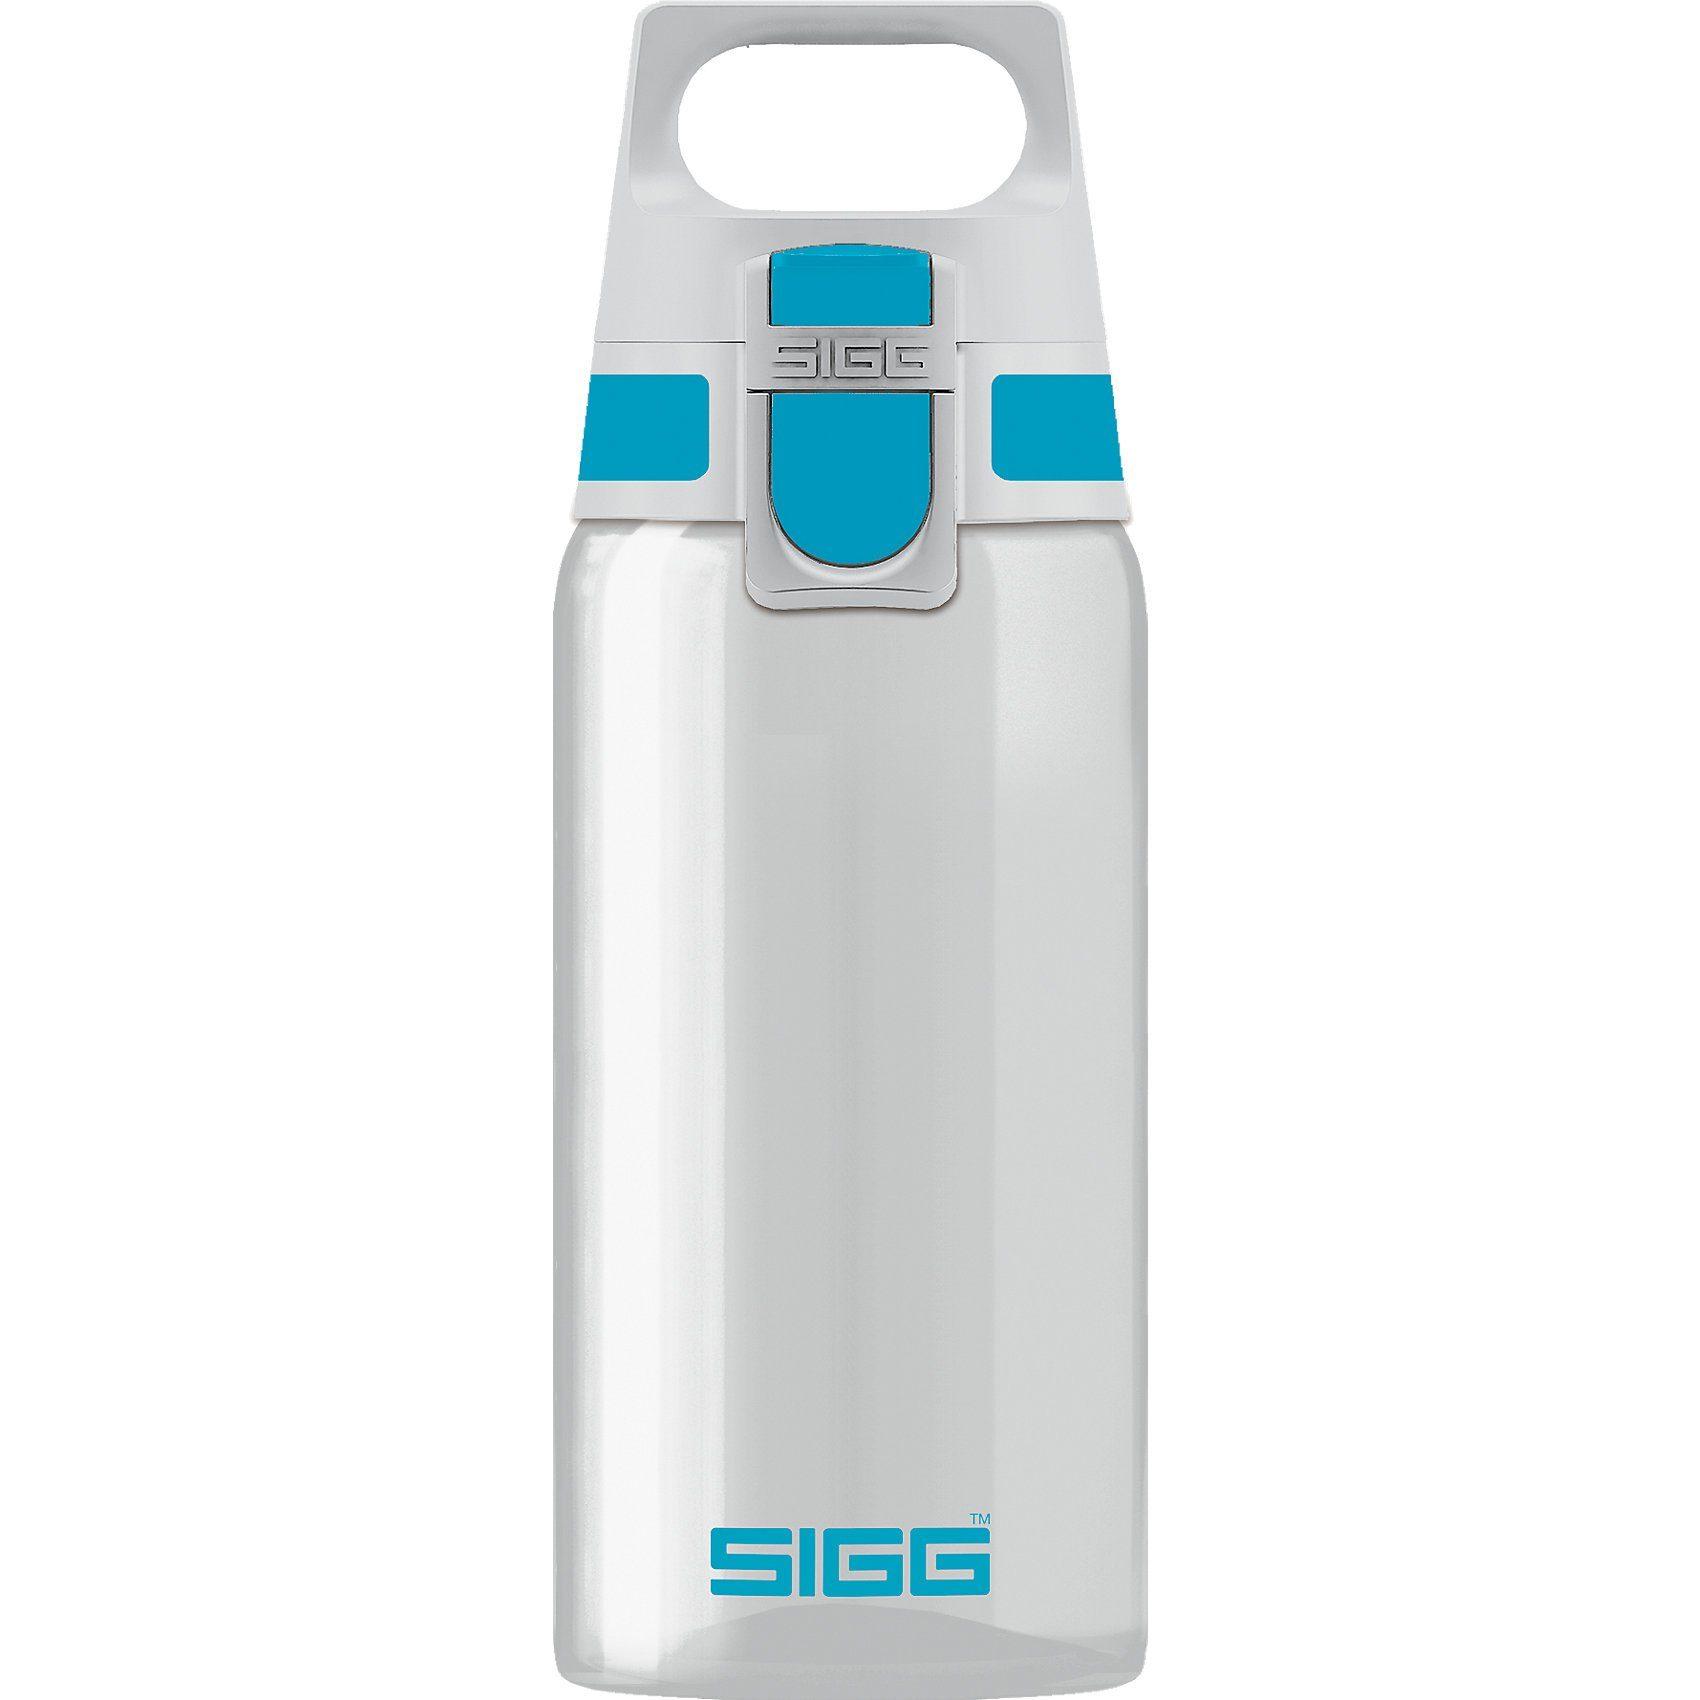 Sigg Tritan-Trinkflasche TOTAL CLEAR ONE Aqua, 500 ml